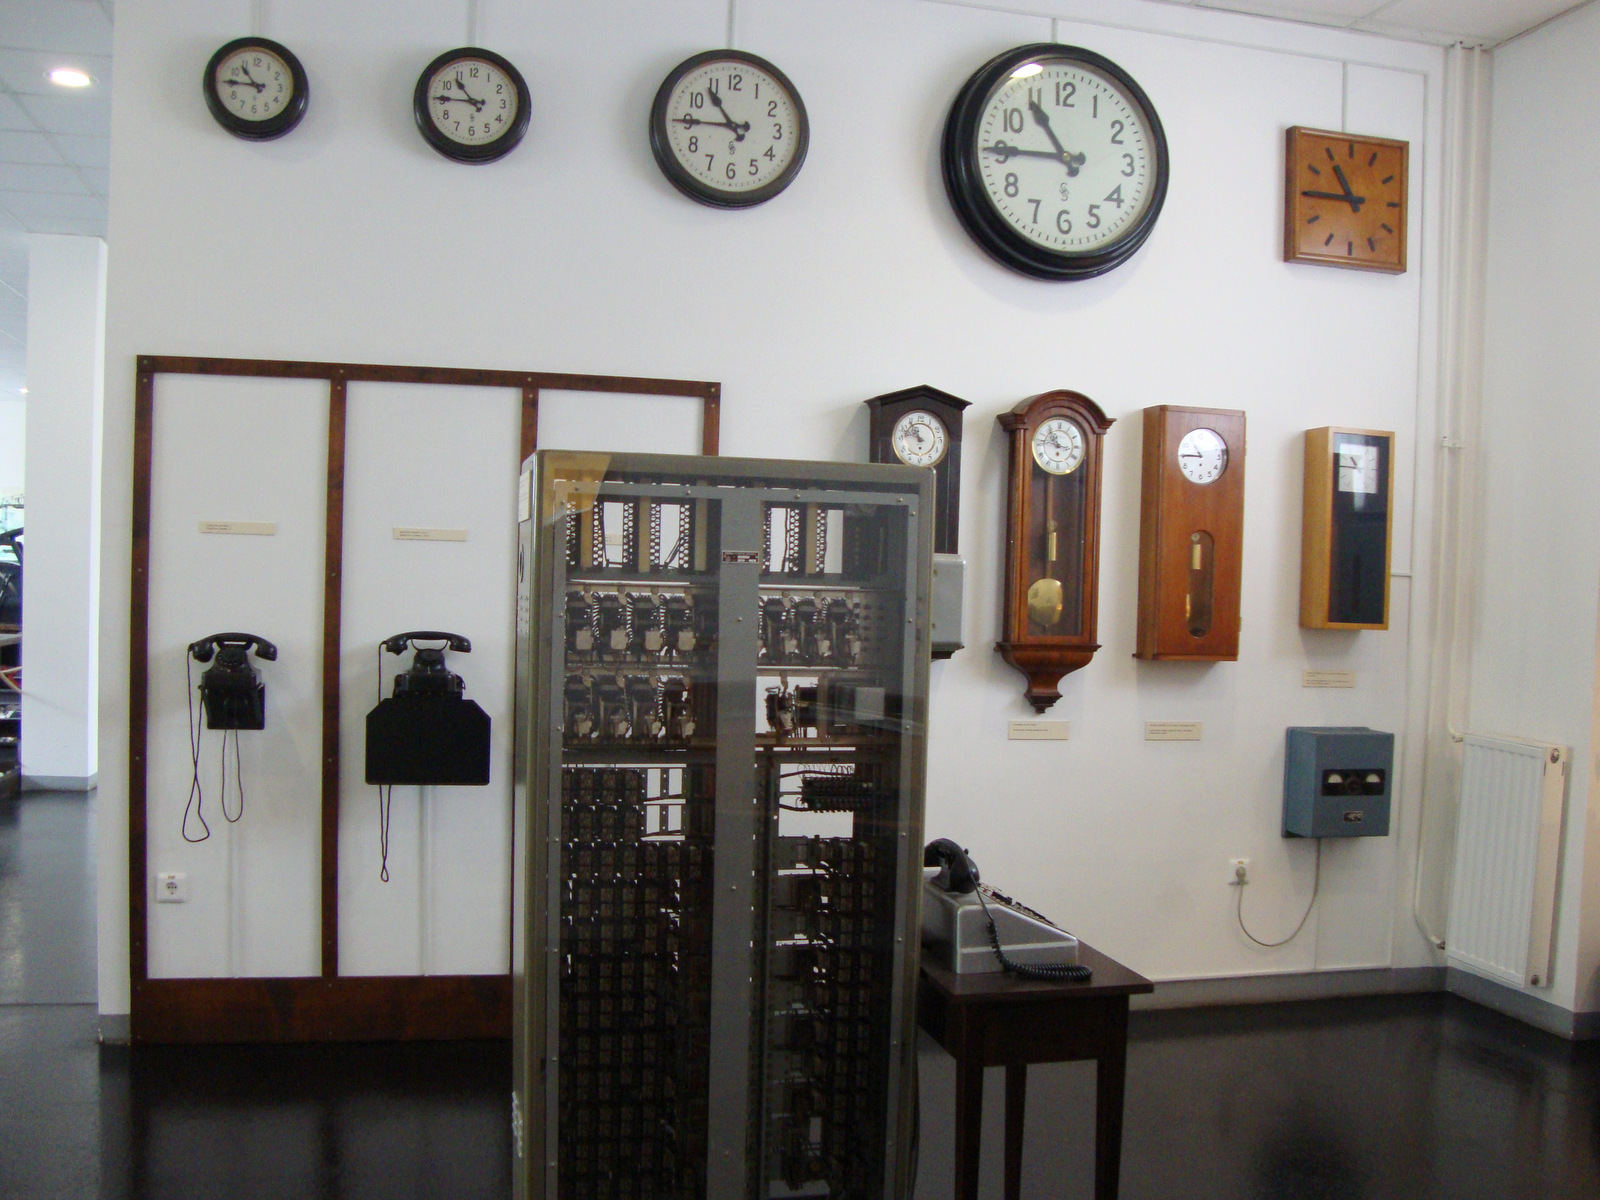 Železniške ure